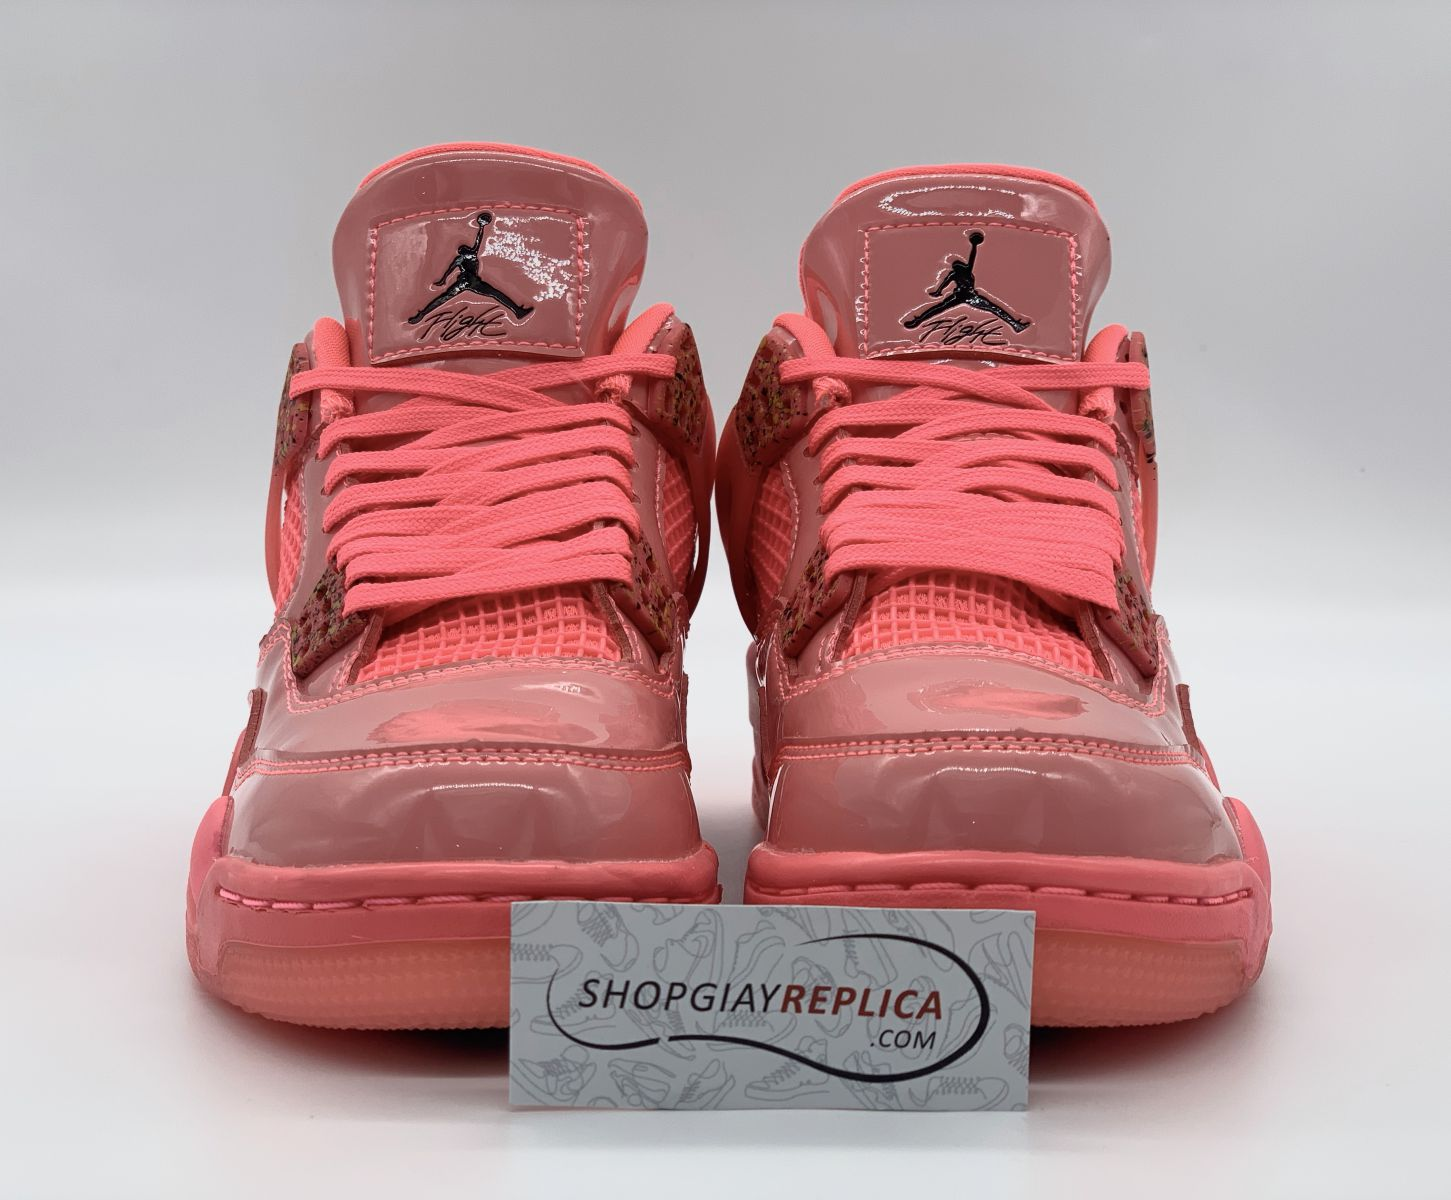 Nike Jordan 4 Hot Punch